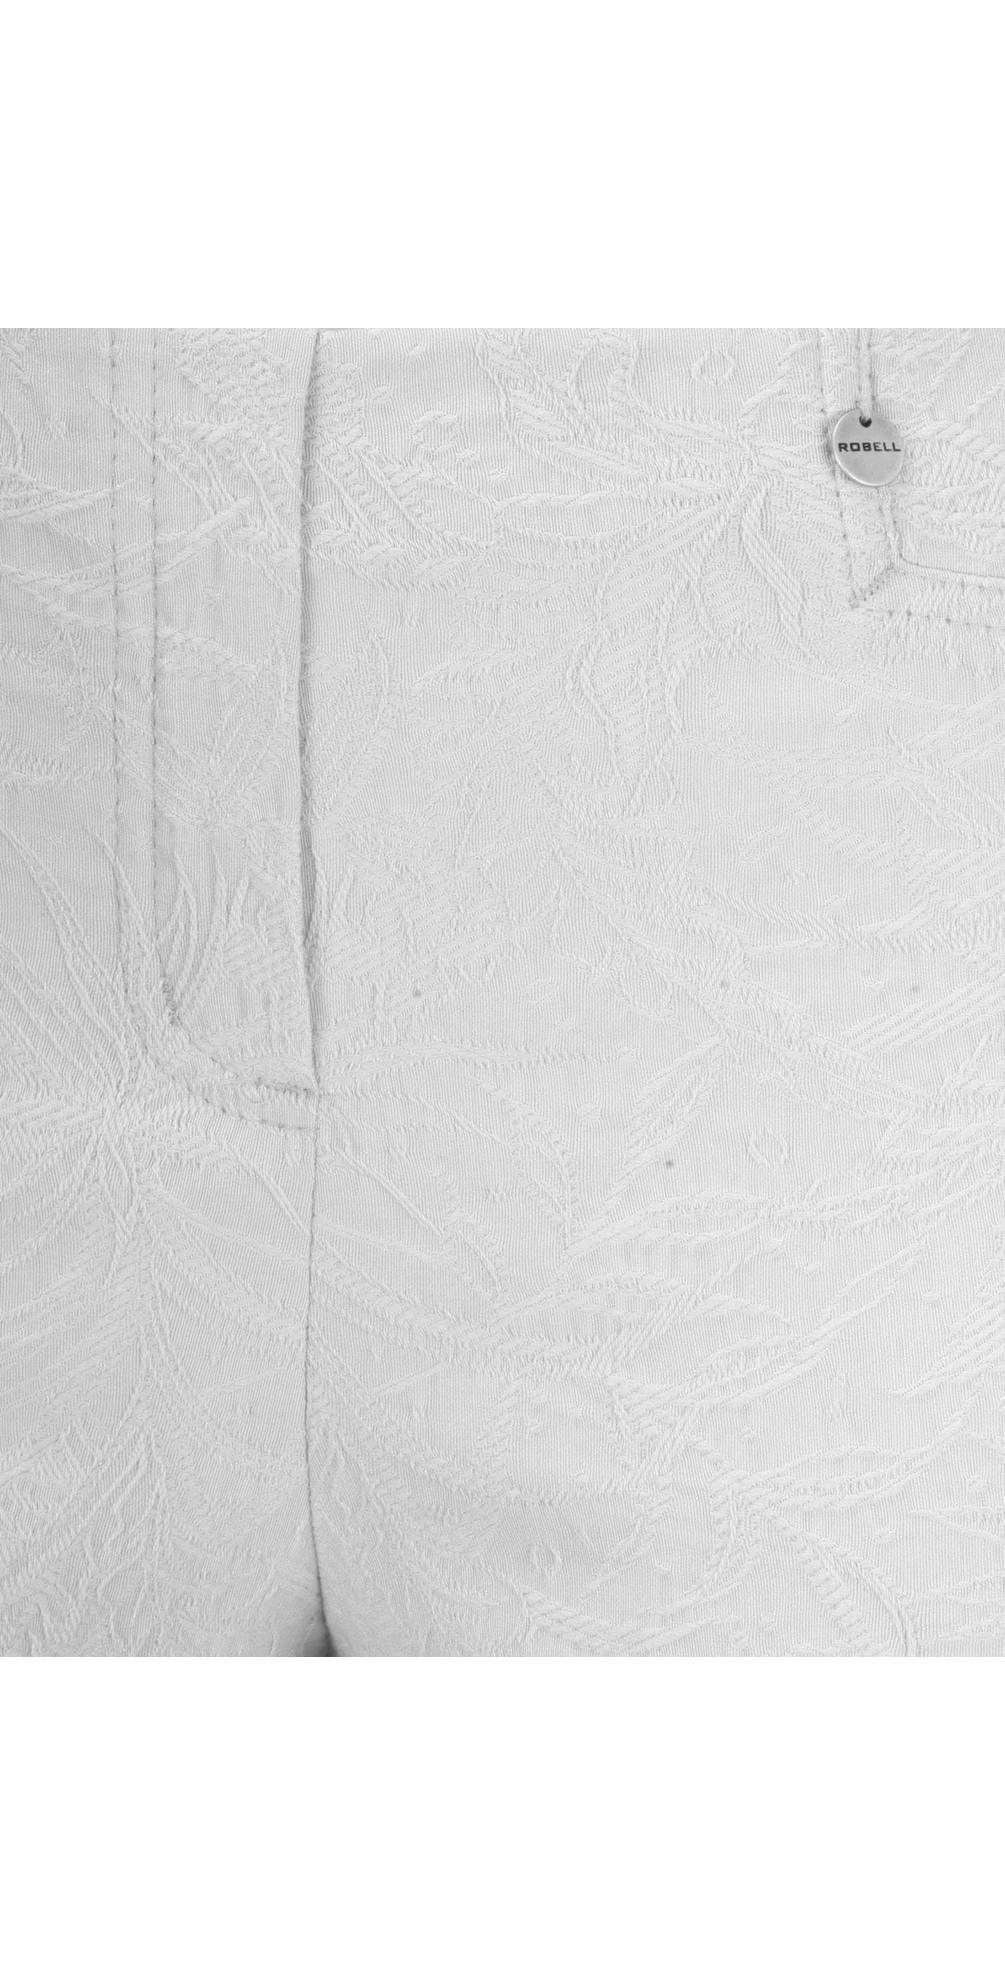 Rose 09 Grey Ankle Length Jacquard Slimfit Trouser main image